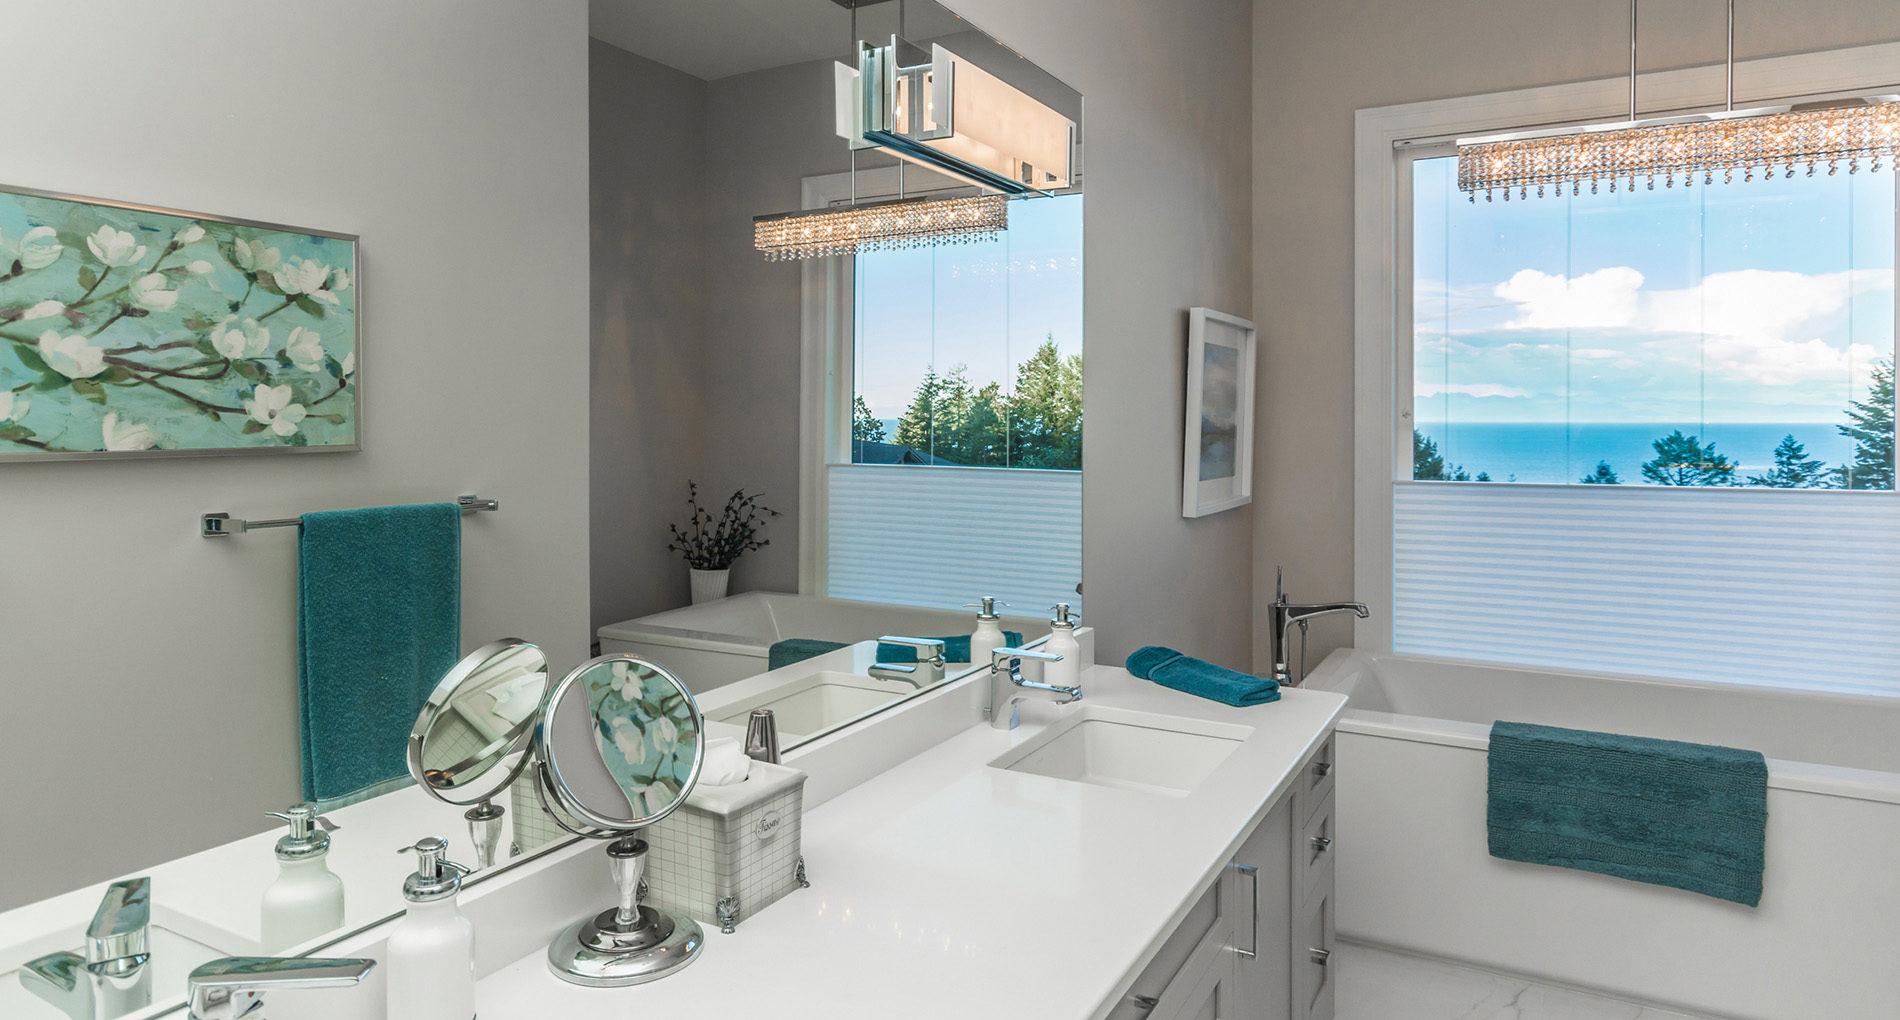 Bathroom Renovation North Island Oakcrestpl3656 Slider